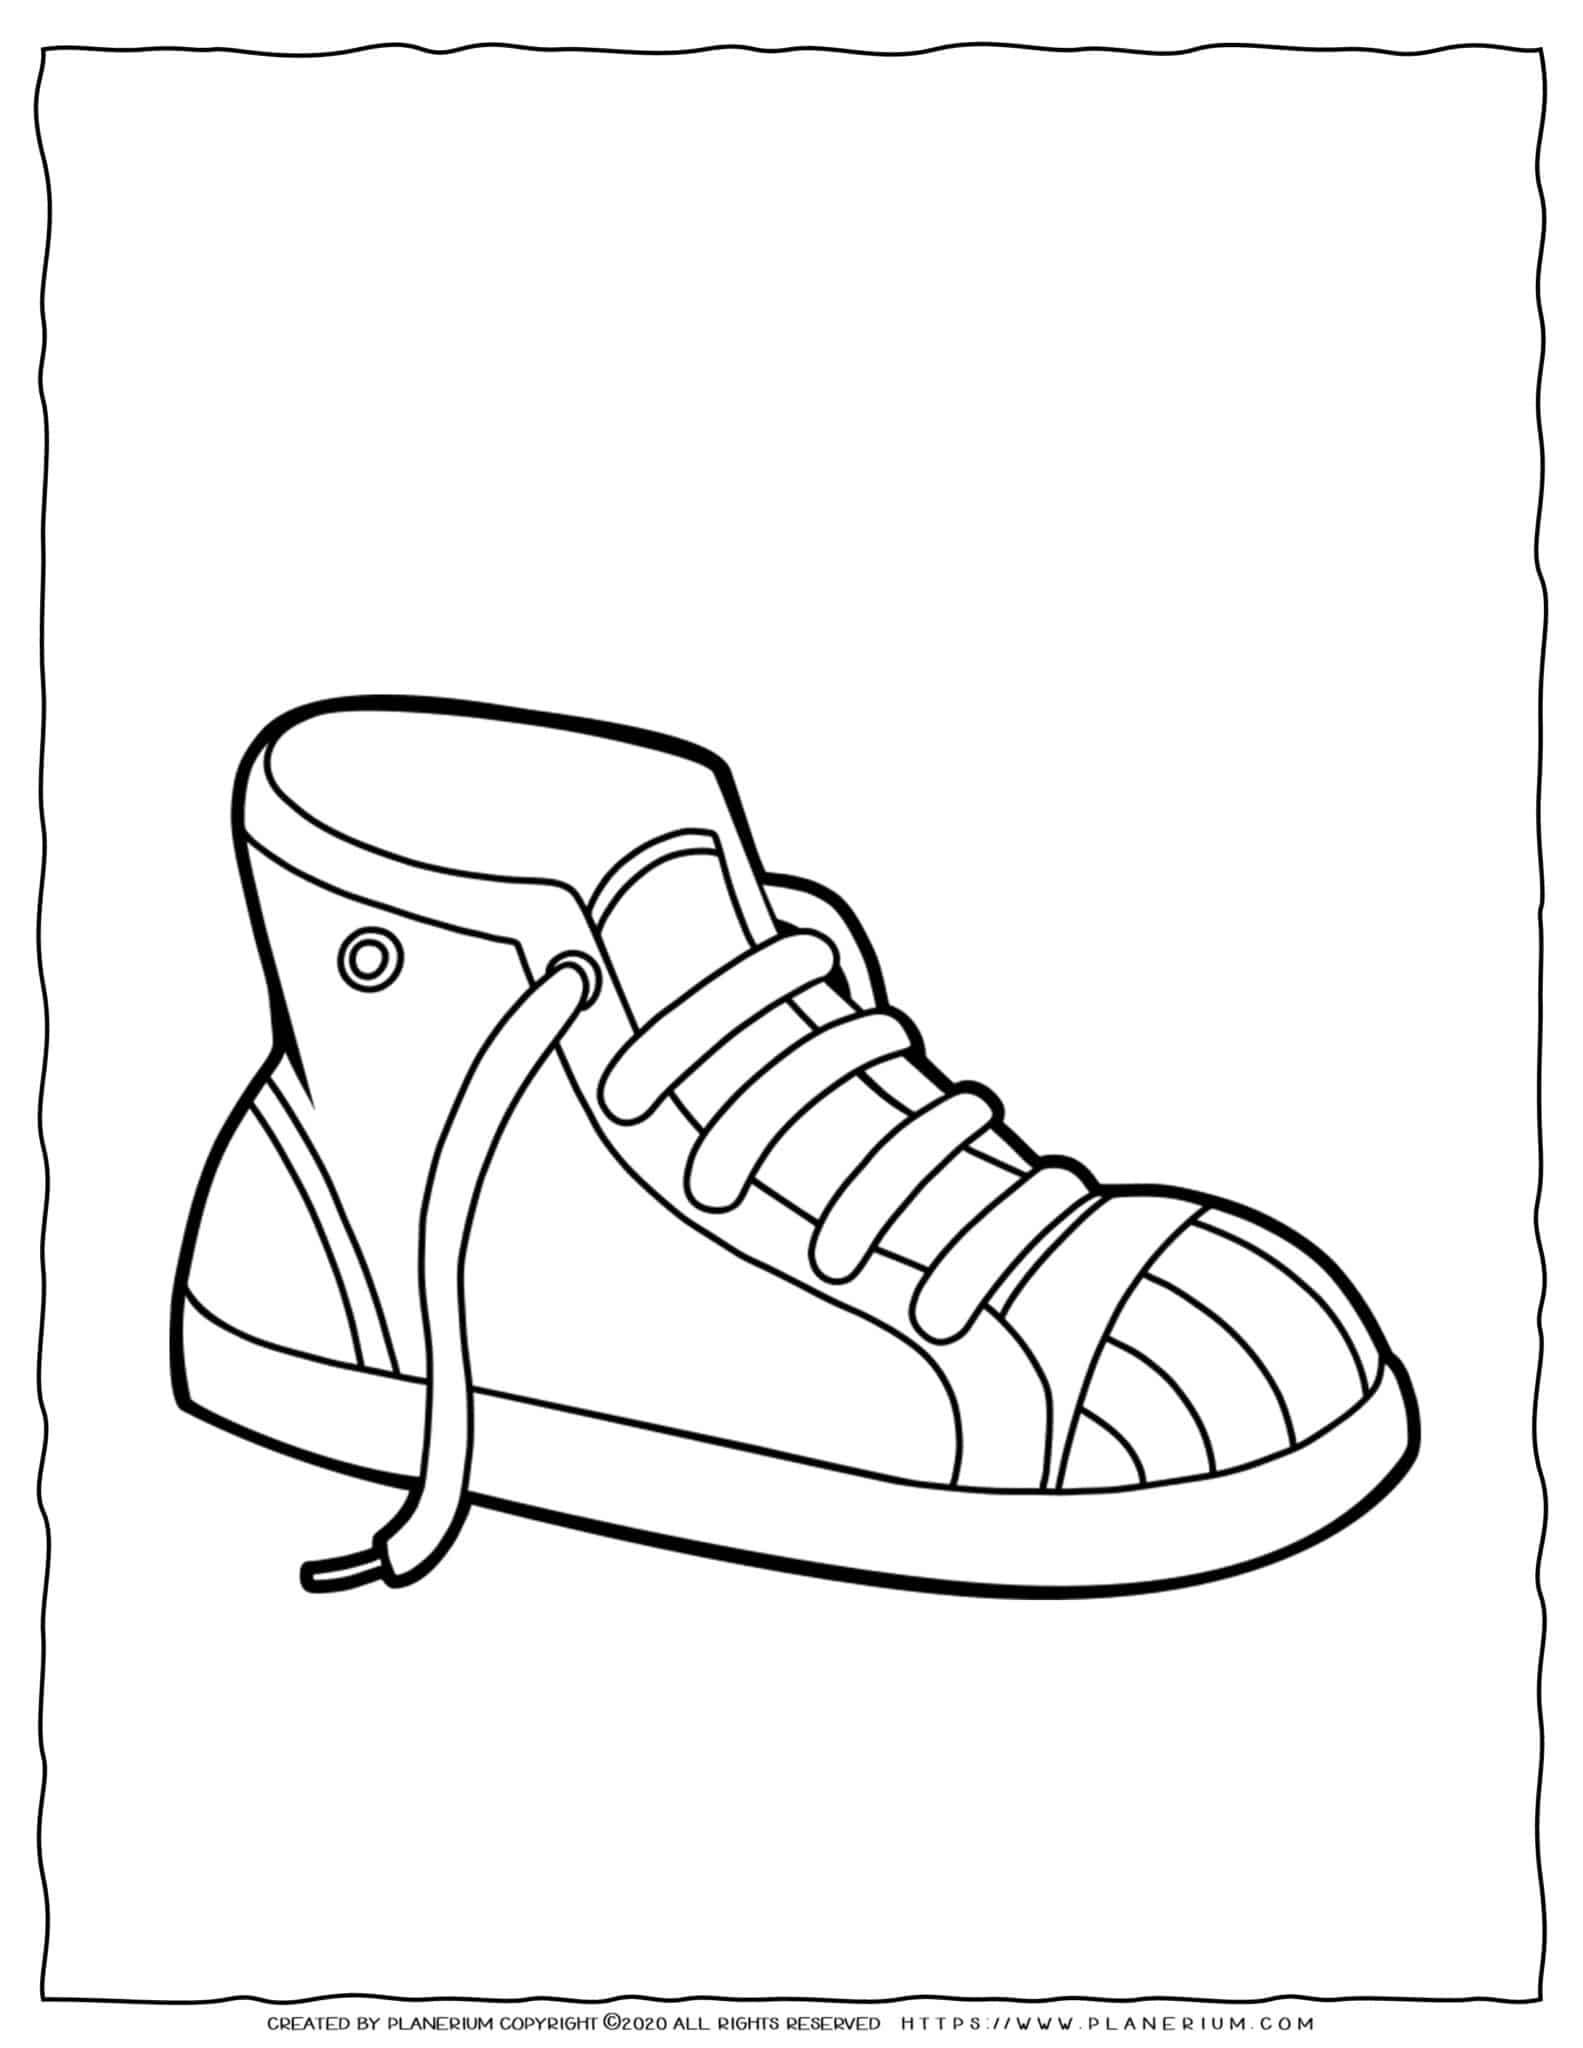 Clothes Coloring Page - Shoe Sneakers   Planerium